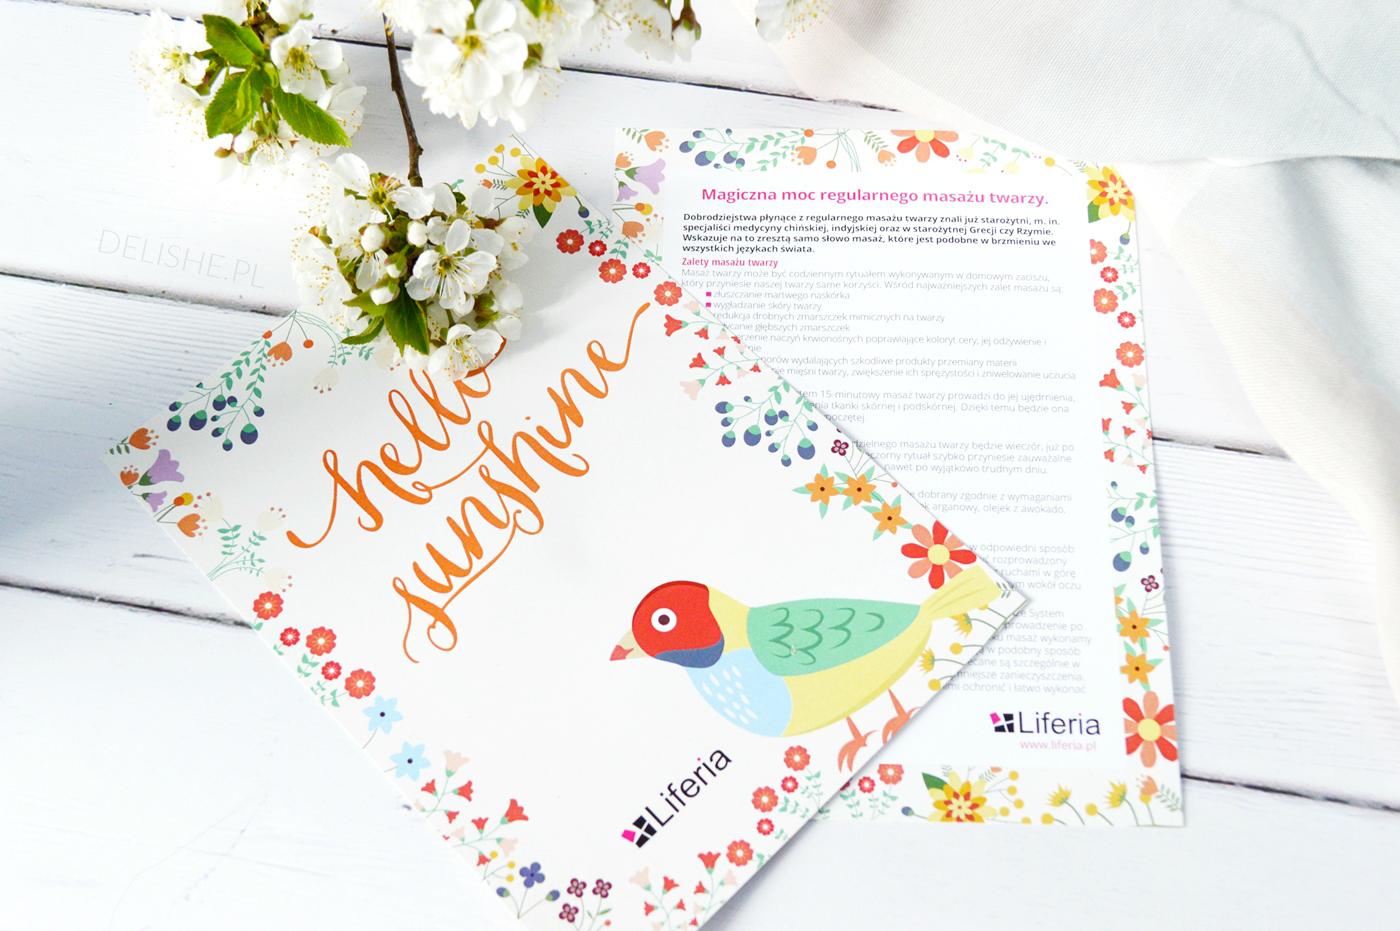 liferia kwiecień 2017 blog